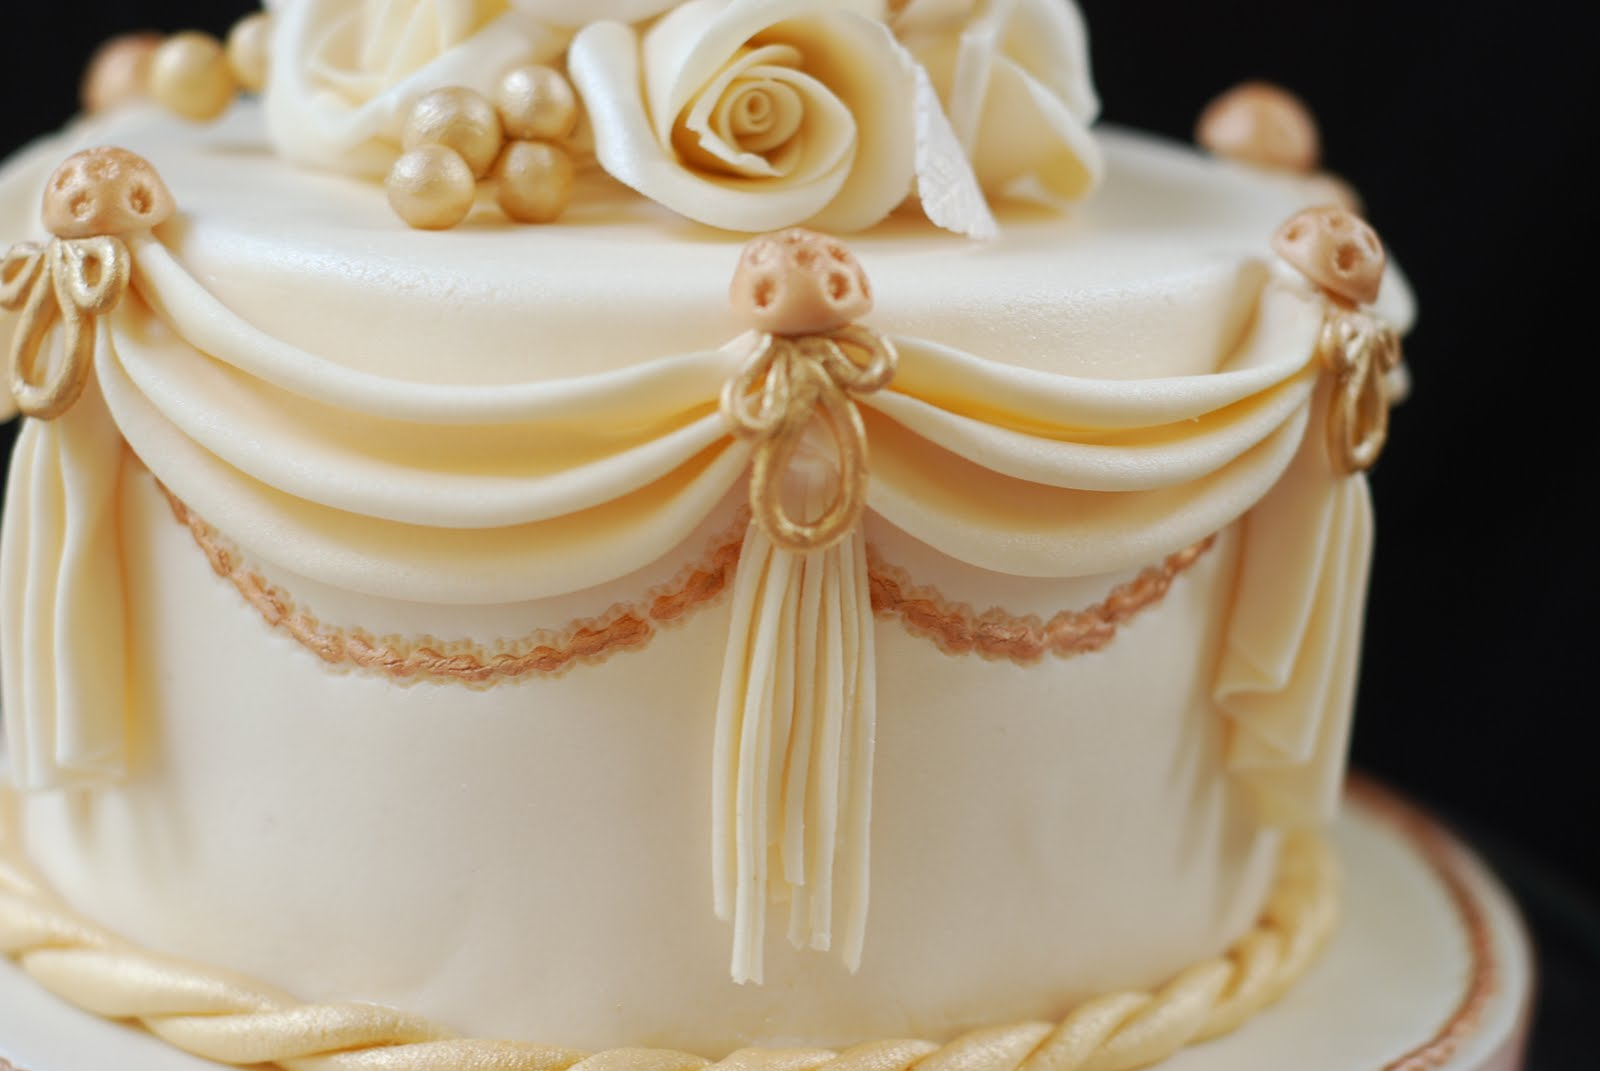 Cake Decorating Class Hk : Cupcakes Confetti: Cake decorating class By Confetti Studio